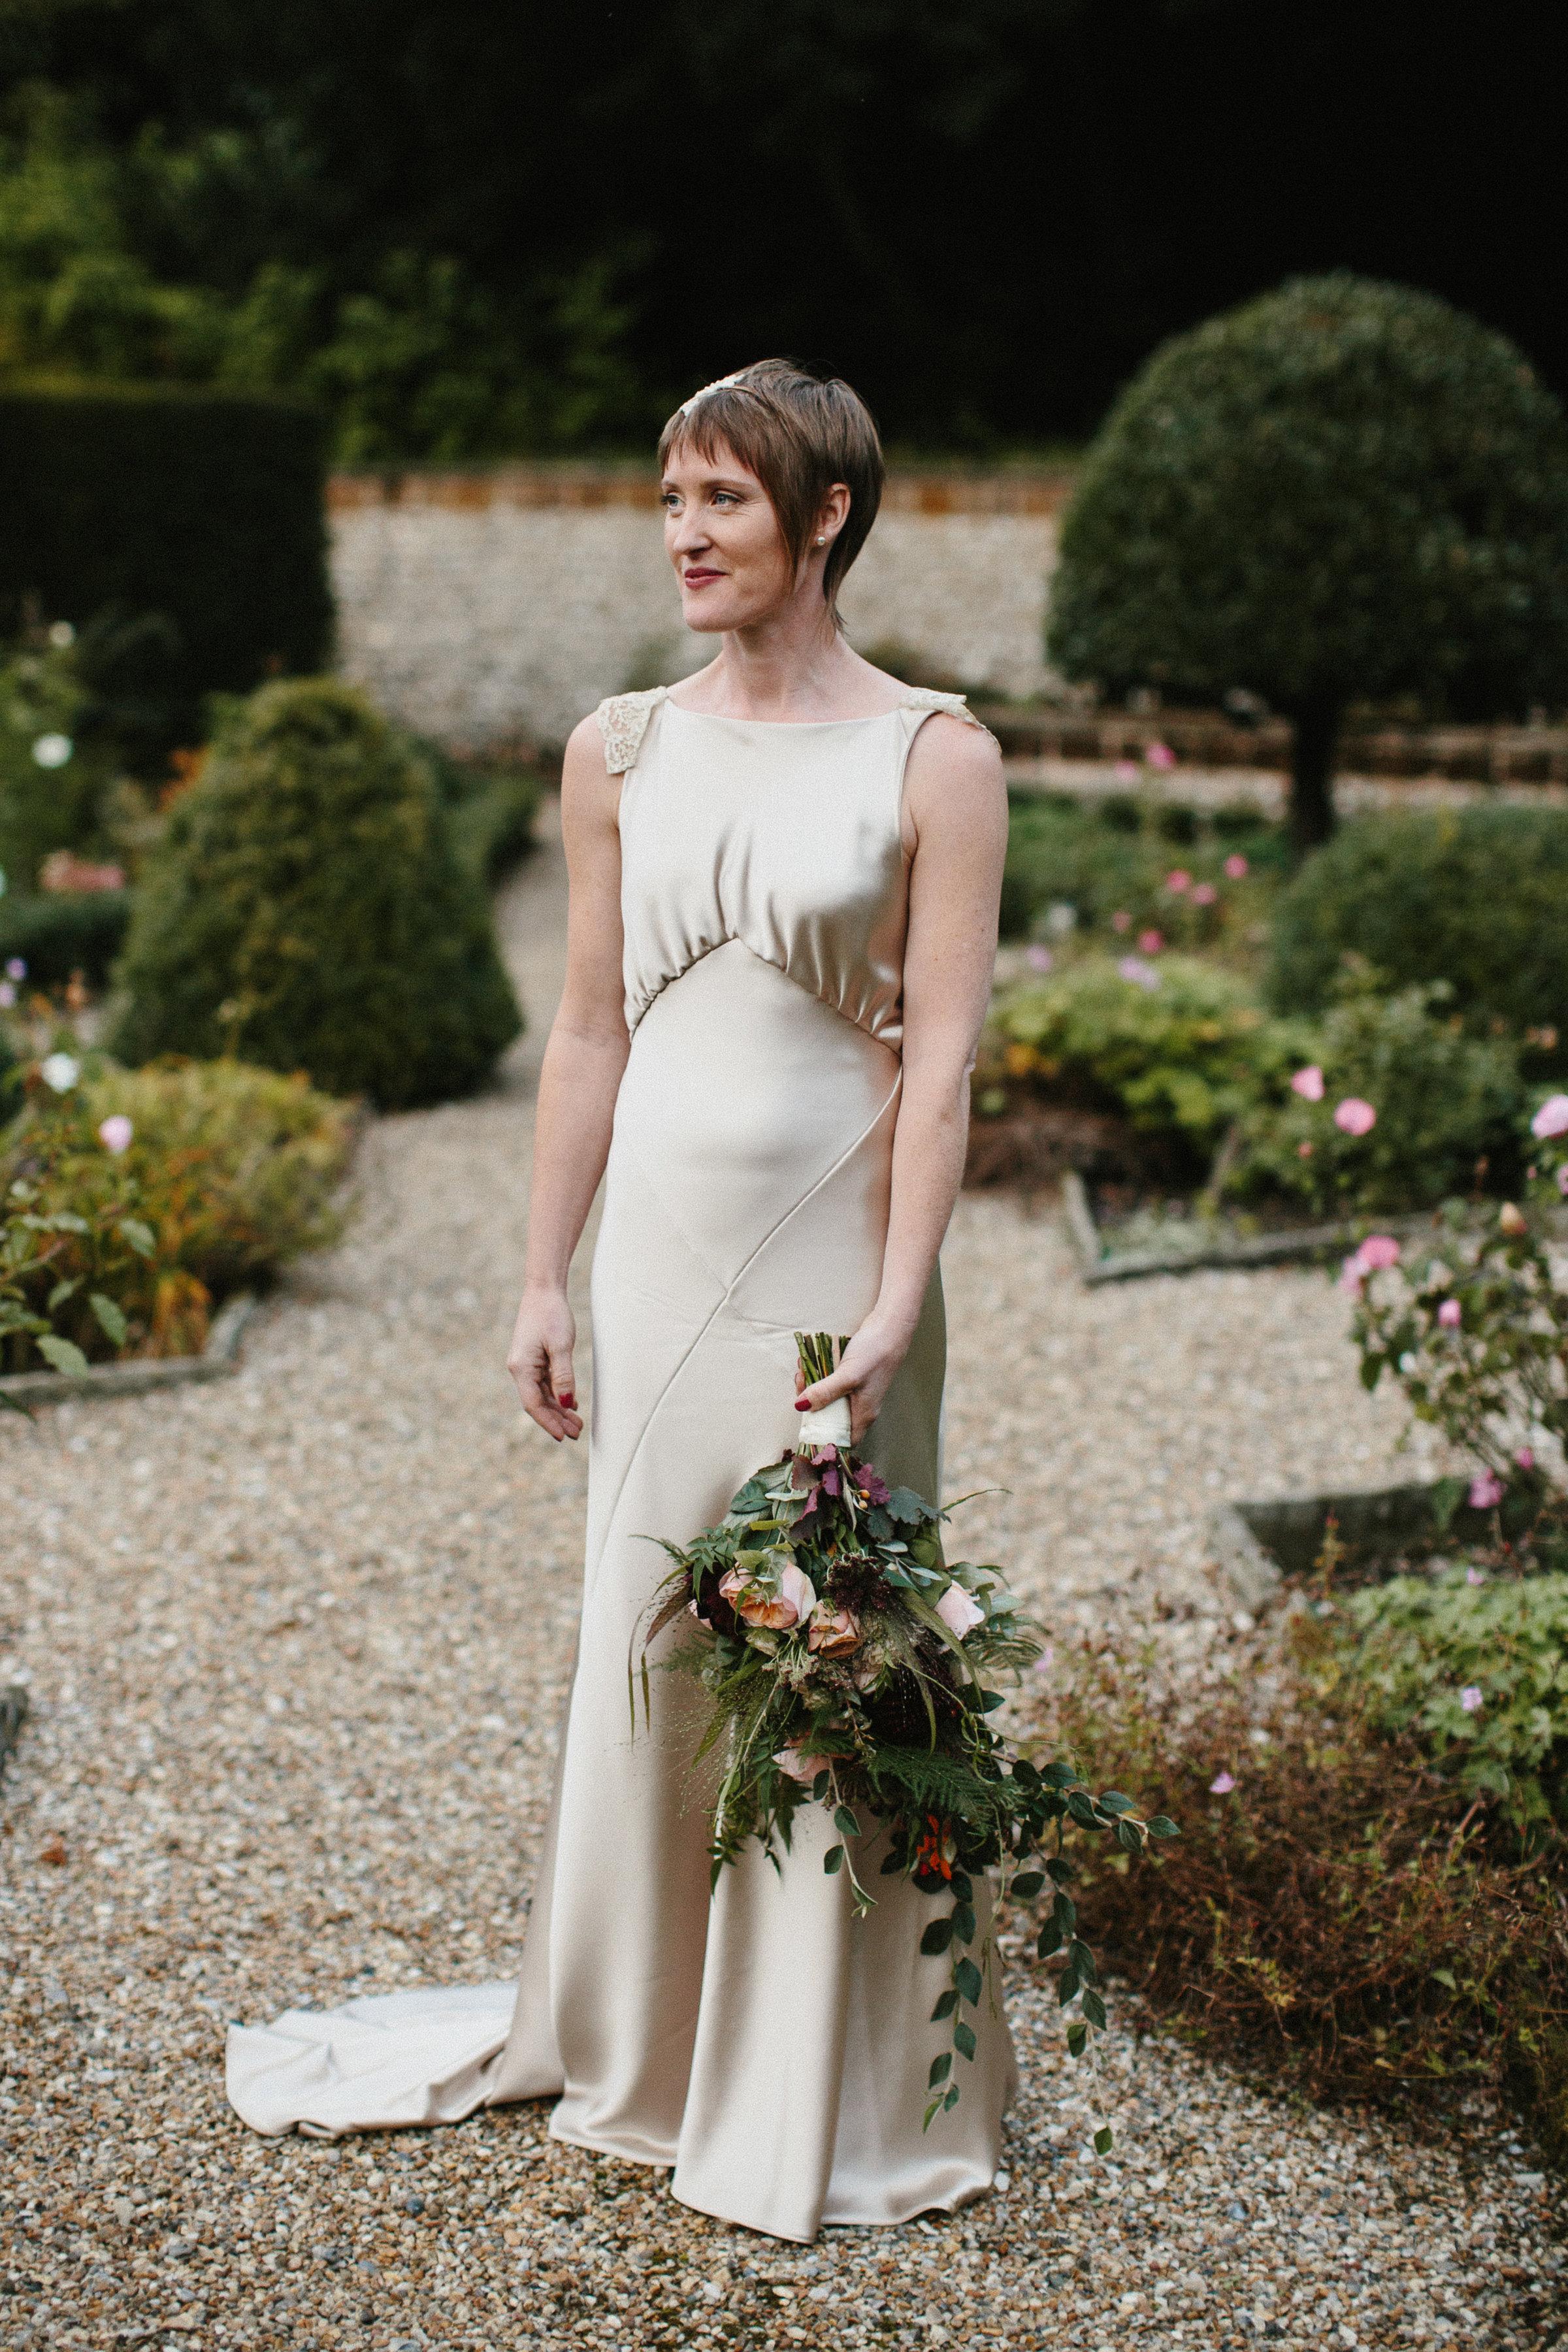 Kate-Beaumont-Sheffield-Honeysuckle-bias-cut-wedding-dress-oyster-Rosie43.jpg